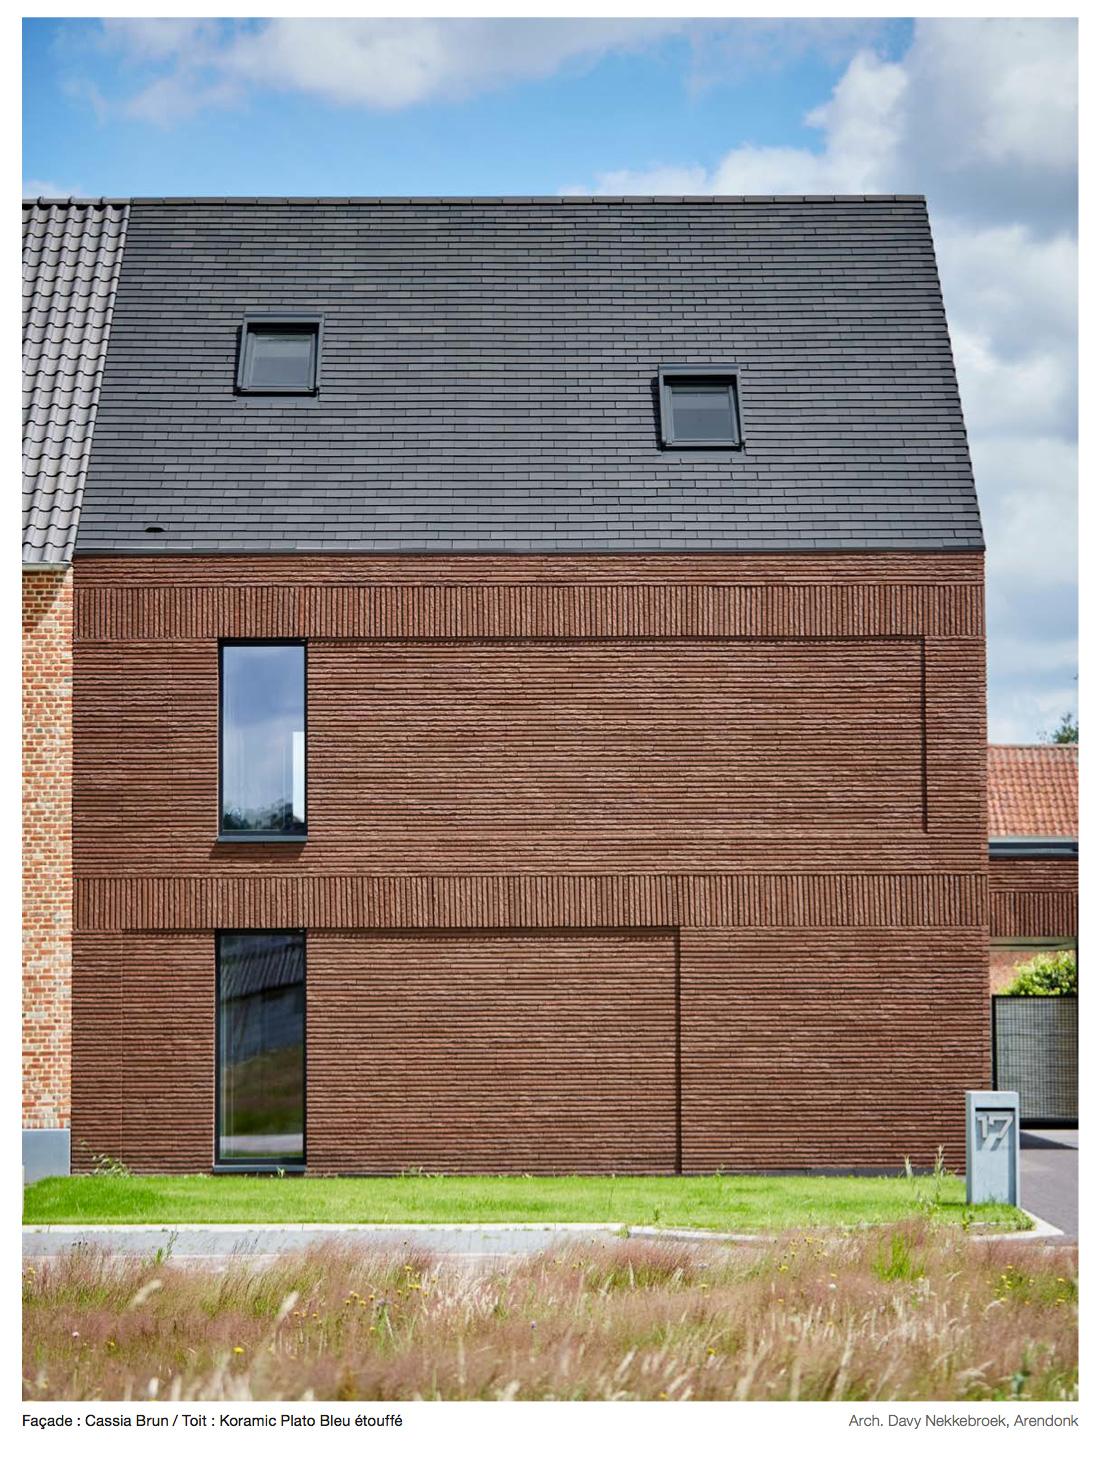 ditail-materiales-cosntruccion-soluciones-cassia-wienerberger